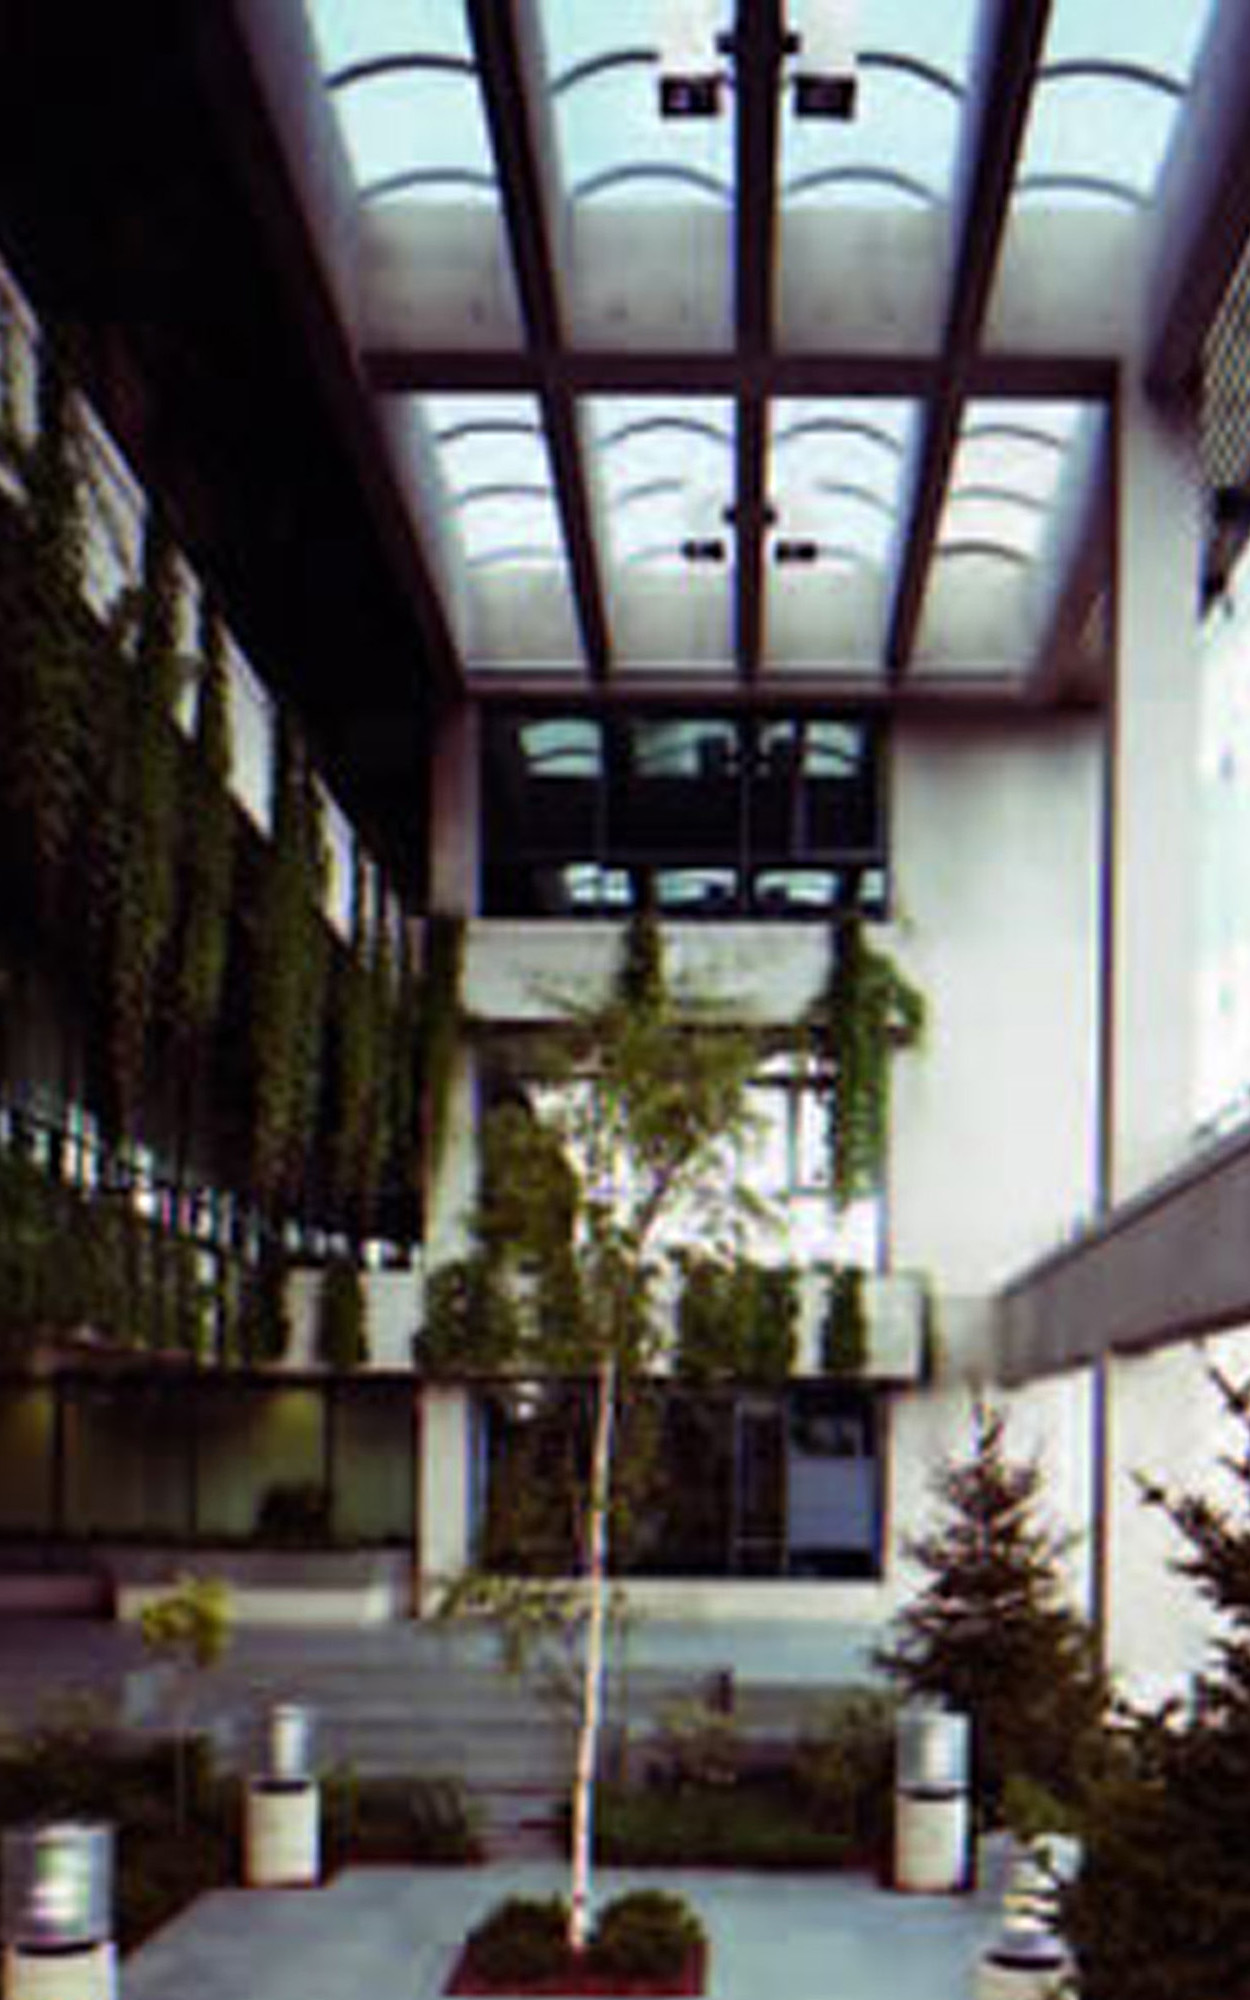 Parks Canada Regional Headquarters